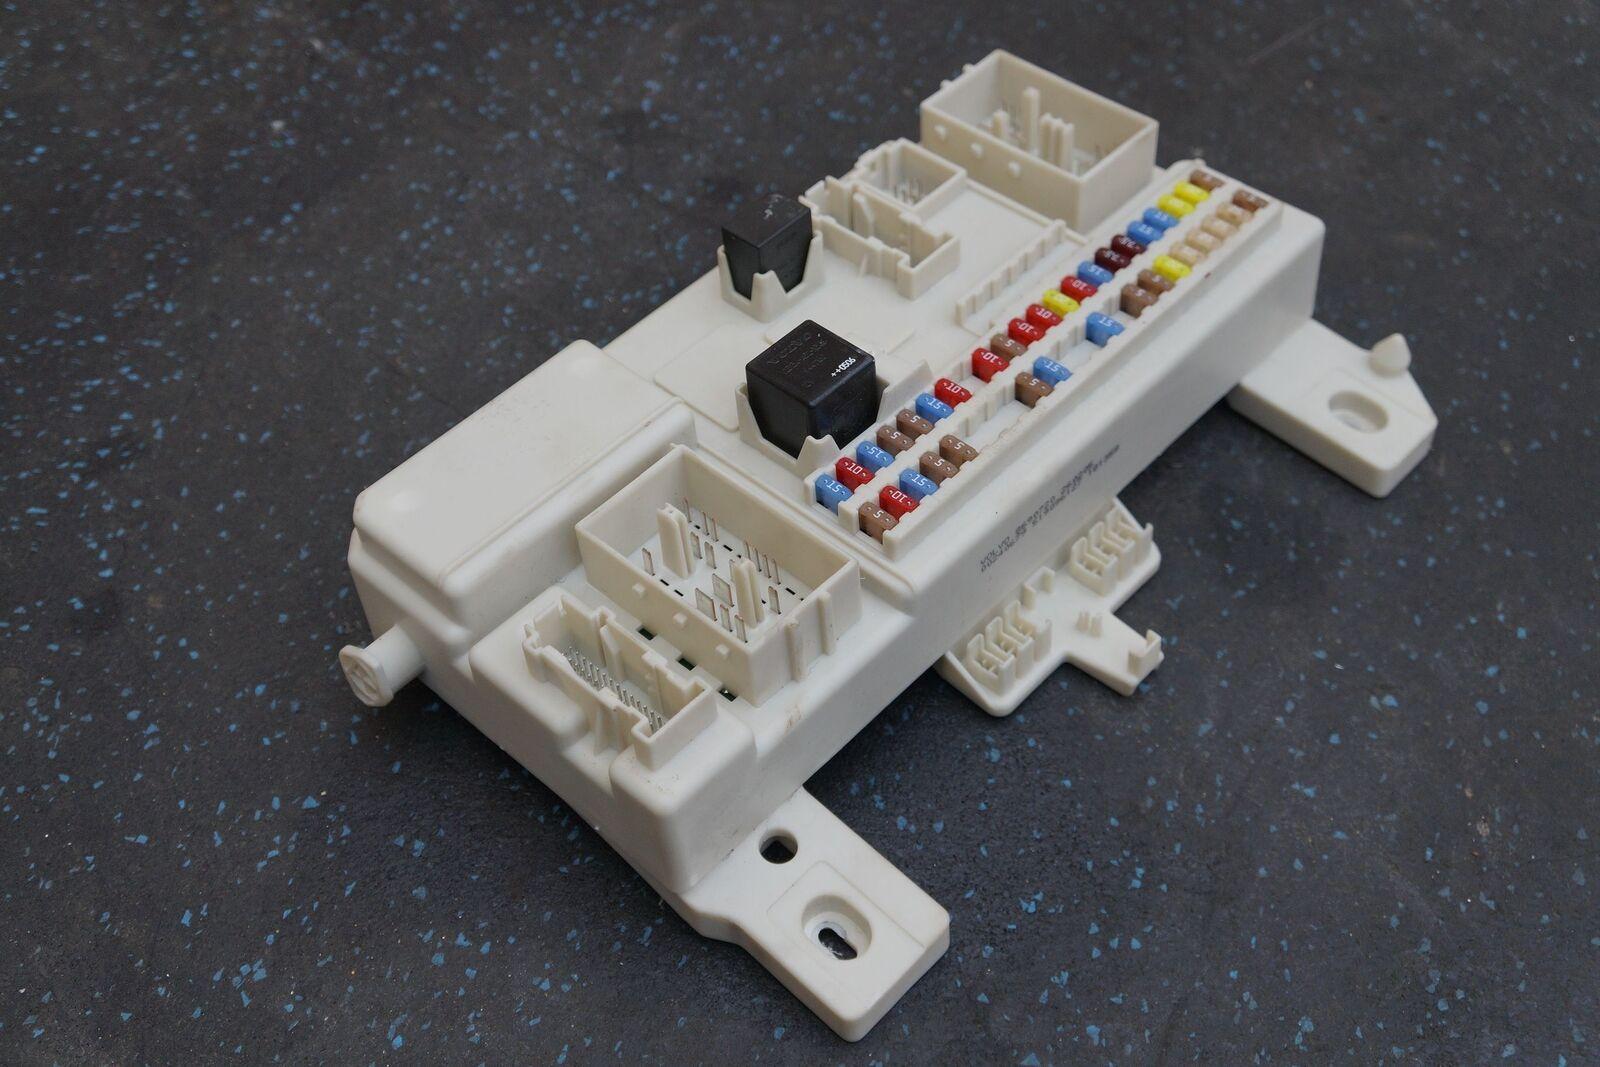 Cabin Distribution Fuse Box Body Control Modul 4G43 14C272 AH Aston Martin DB9 283020802329?fit=1600%2C1067&ssl=1 cabin distribution fuse box body control modul 4g43 14c272 ah aston